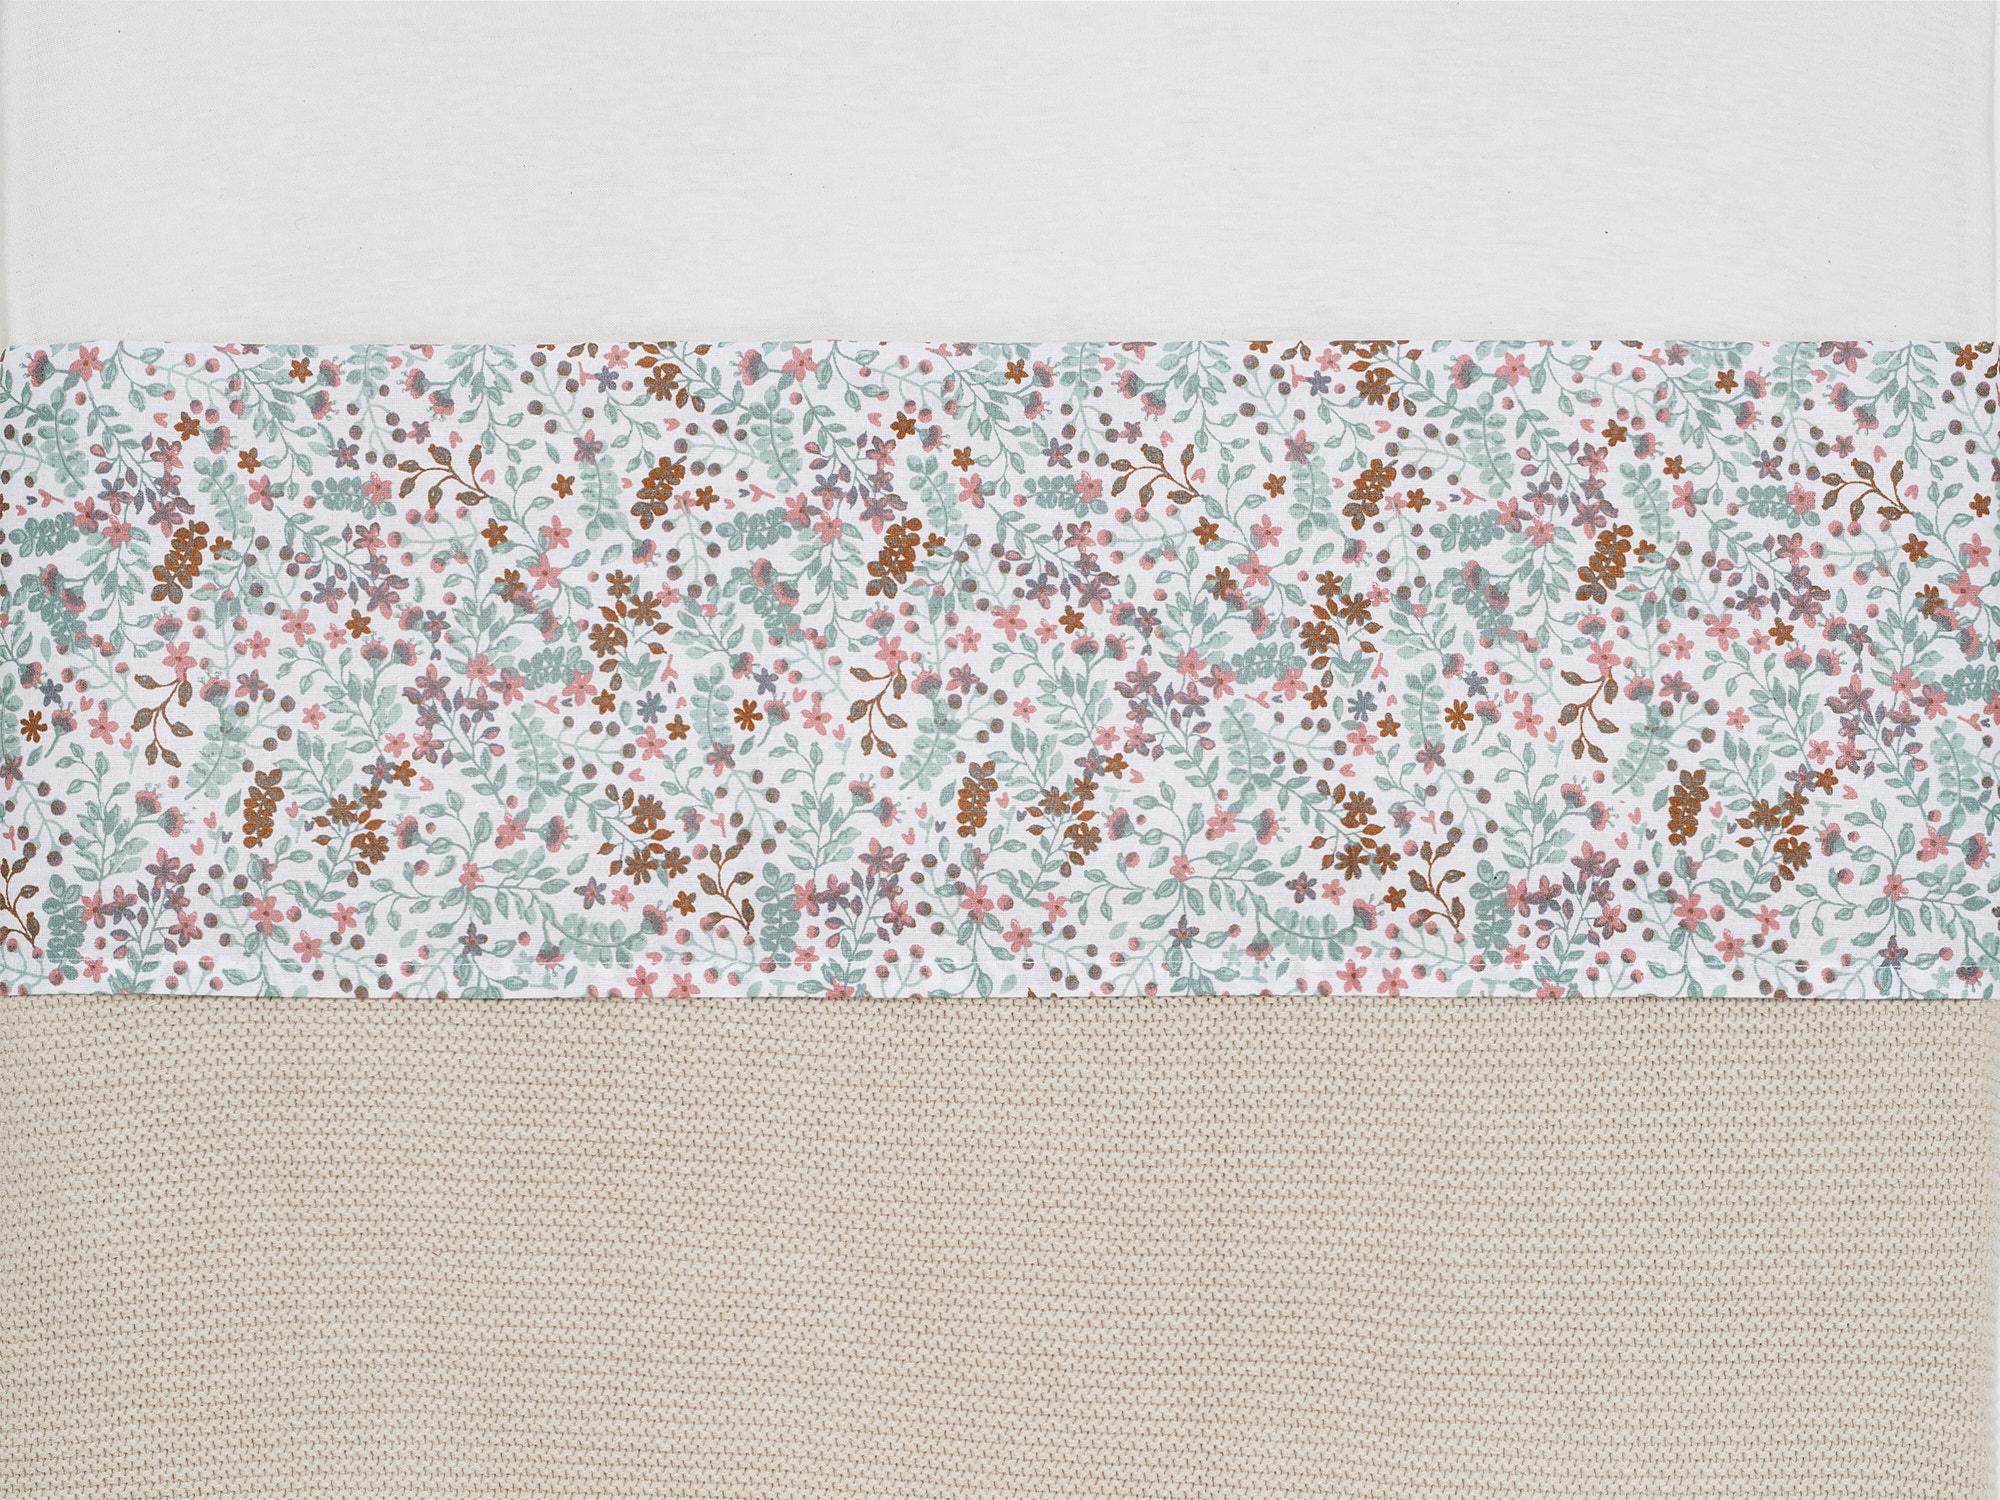 Bettlaken Laken Bloom (Gr. 120x150 cm)